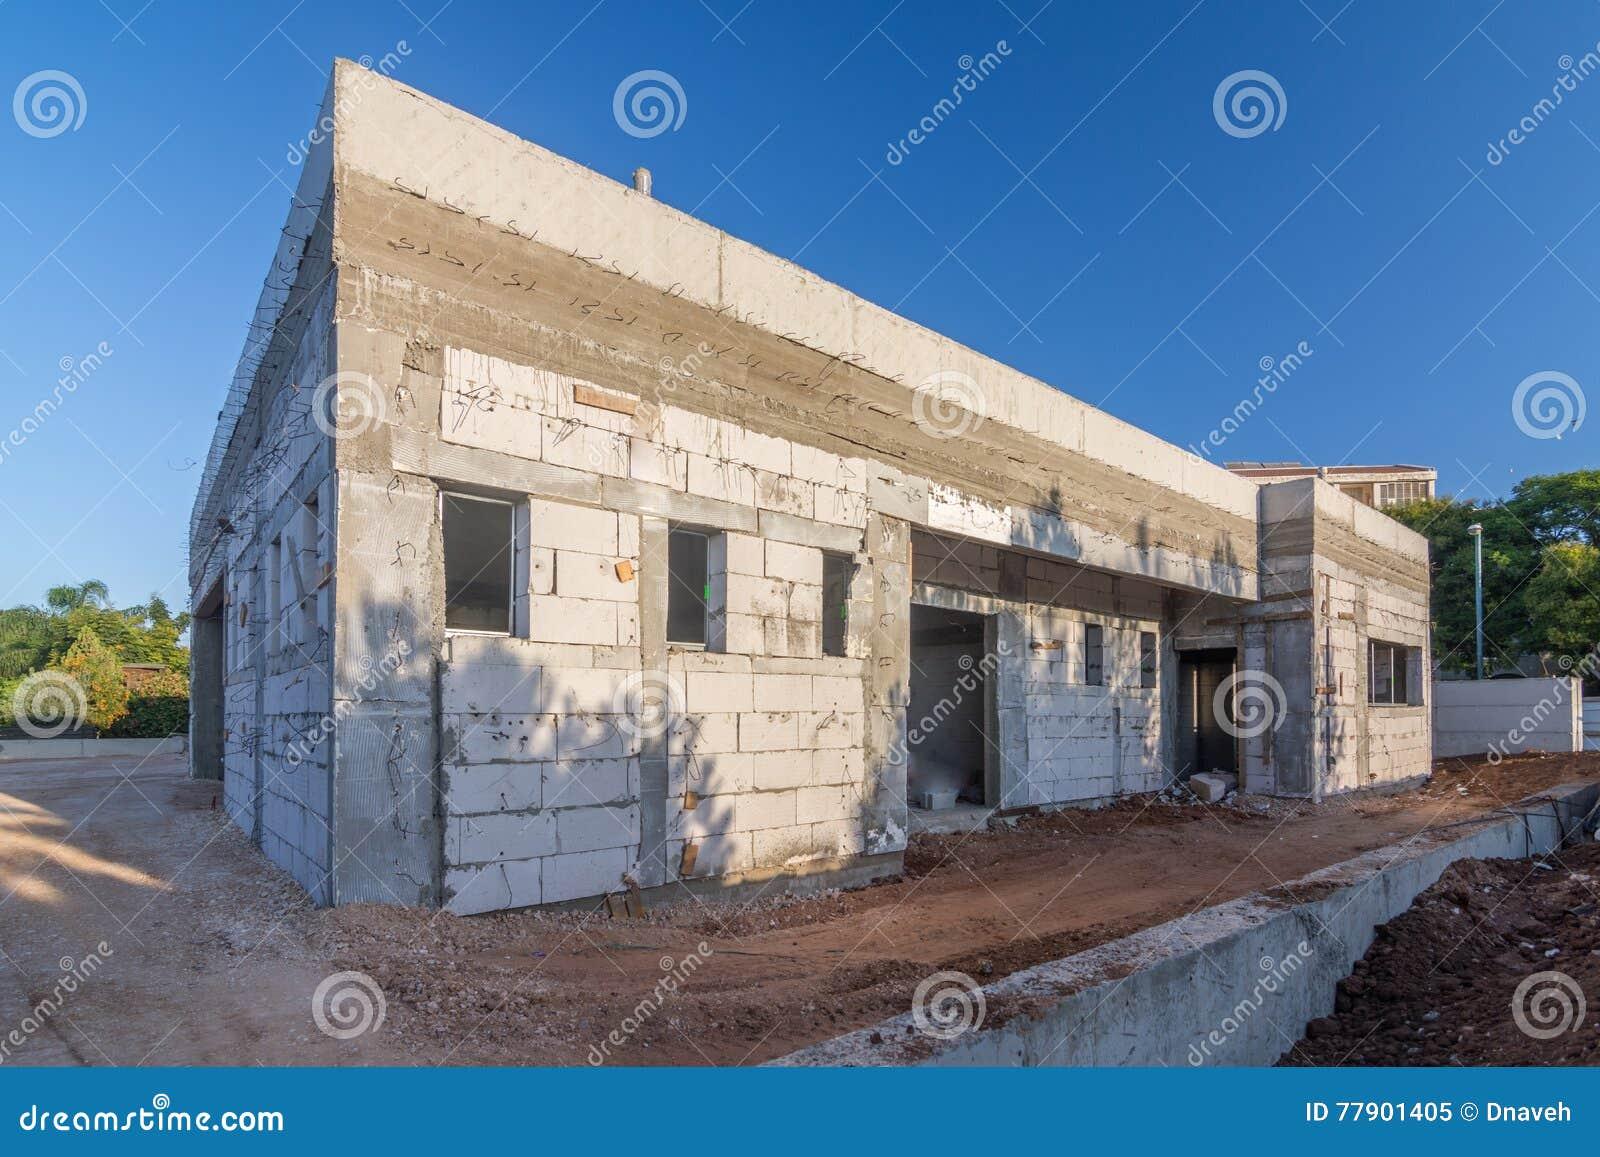 Concrete house under construction the for Brick house construction